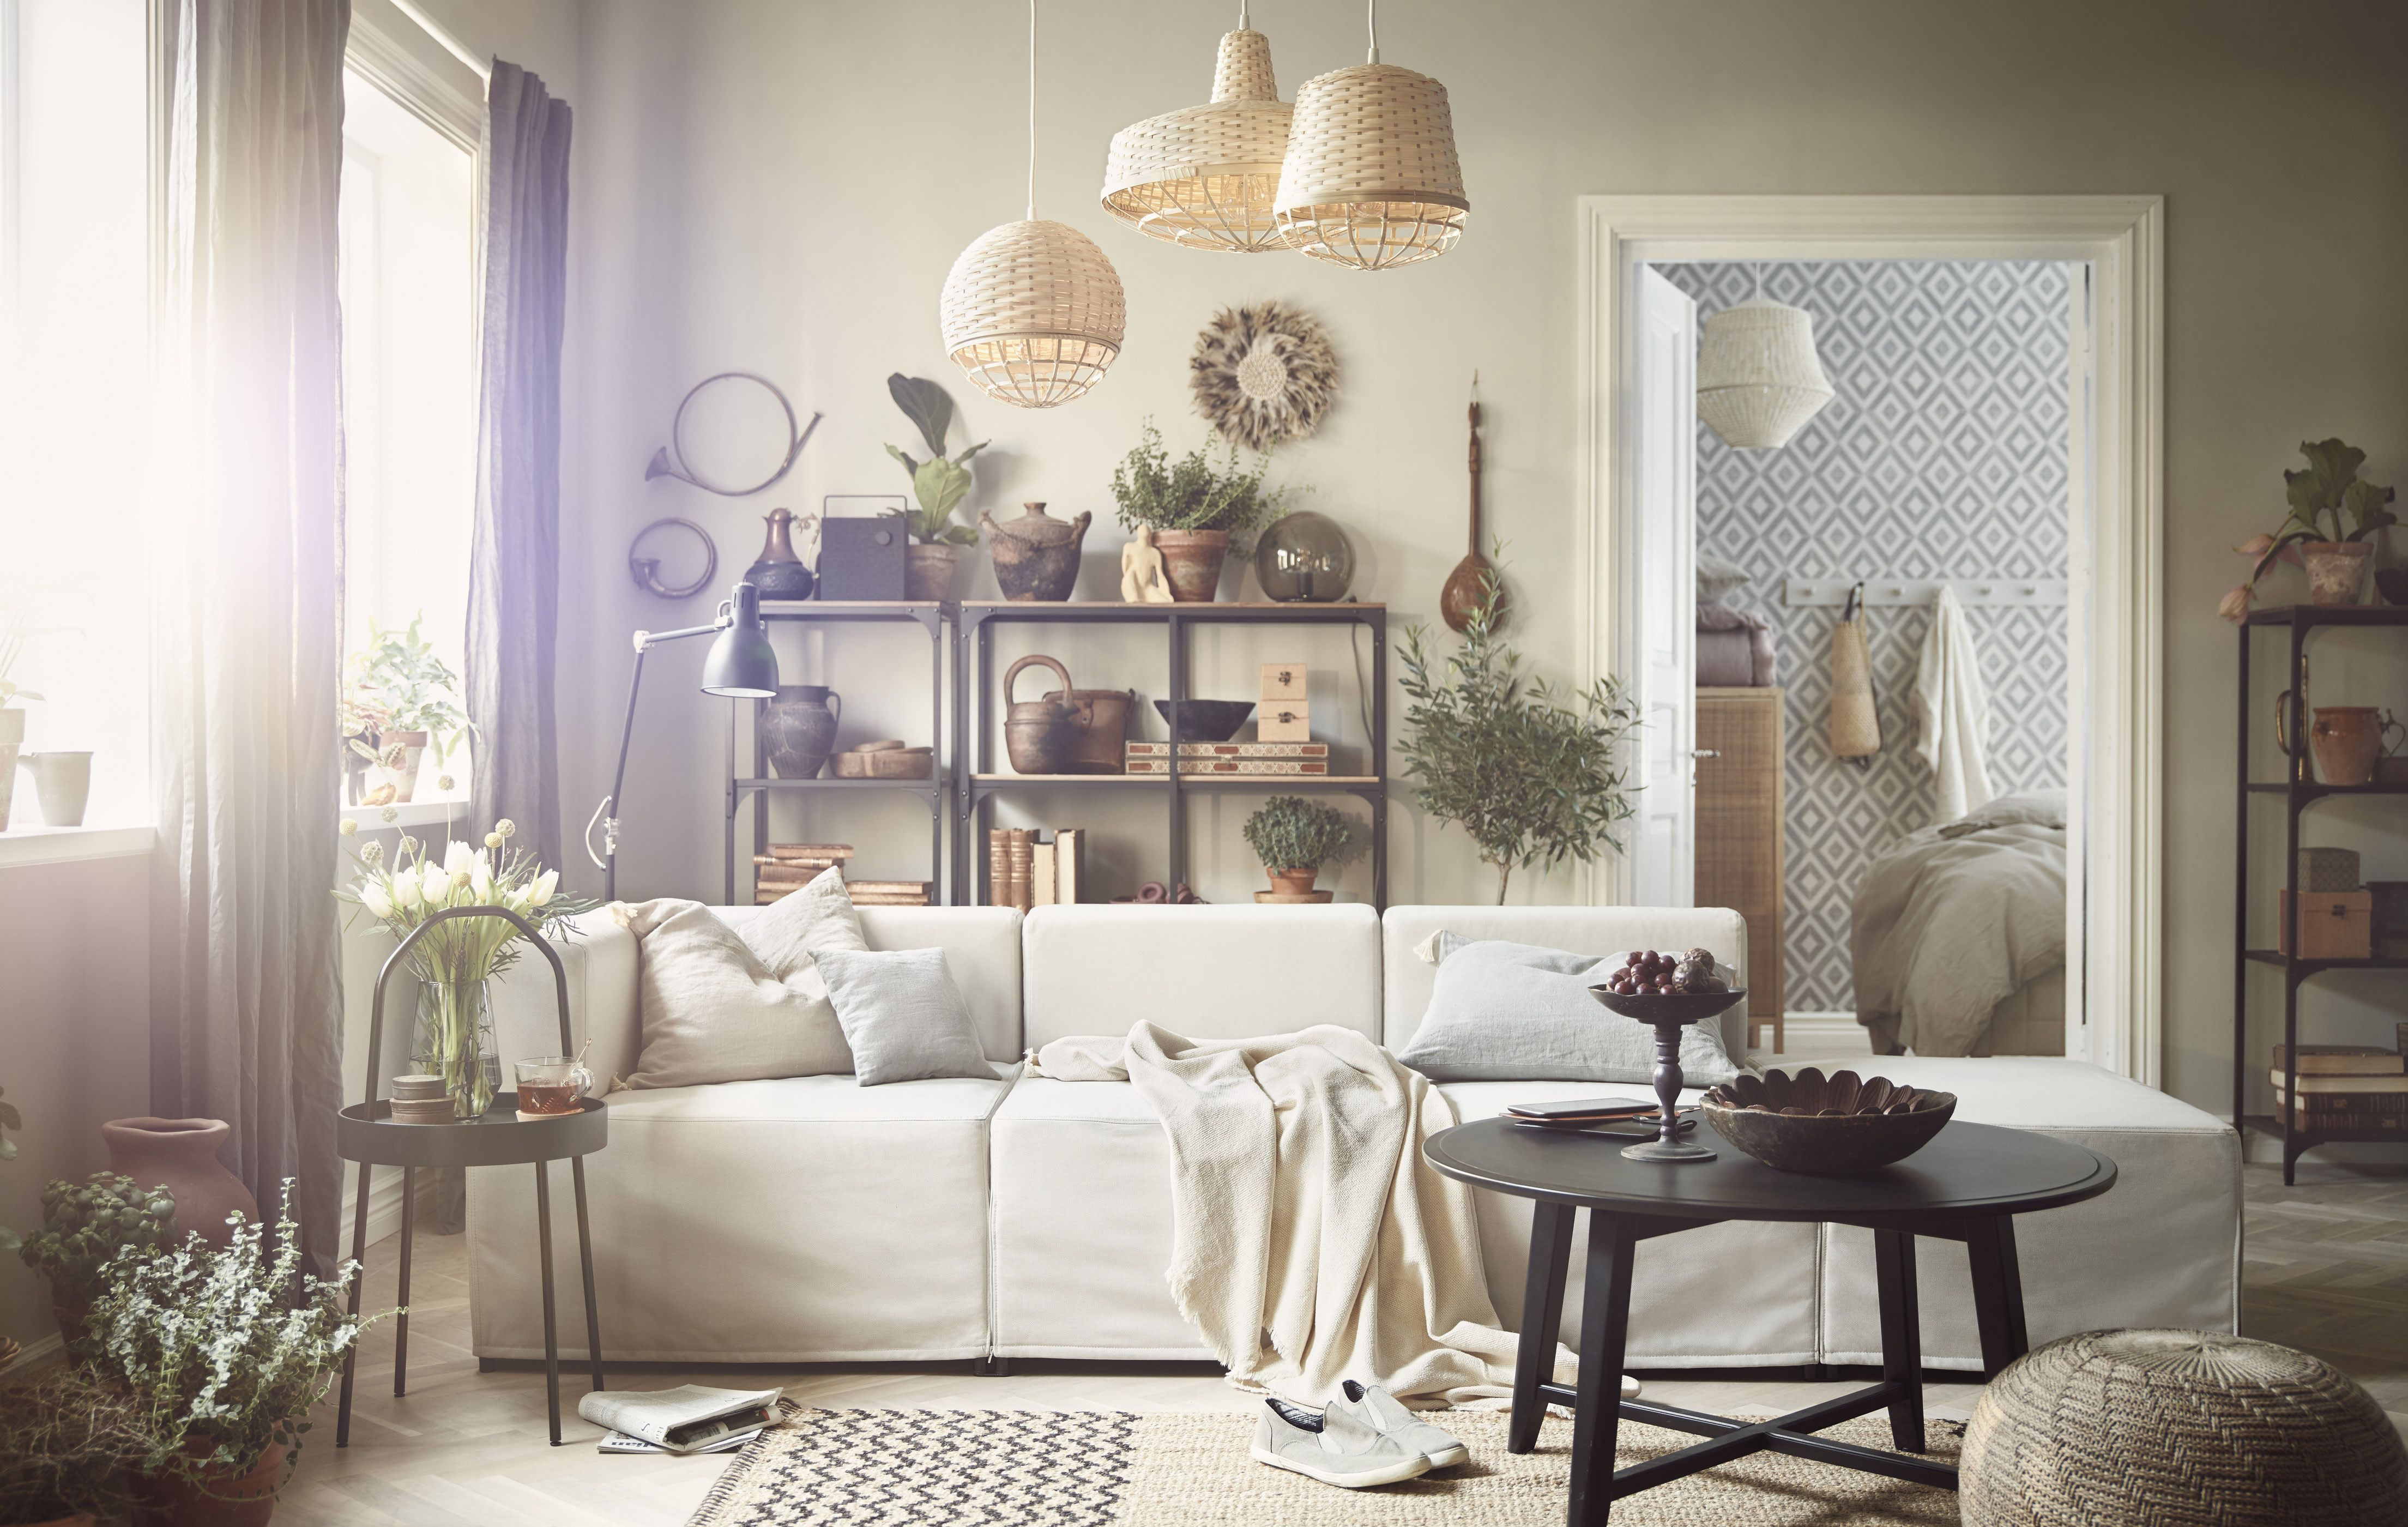 Flexible Furniture Designed For Fluid Living The Modular